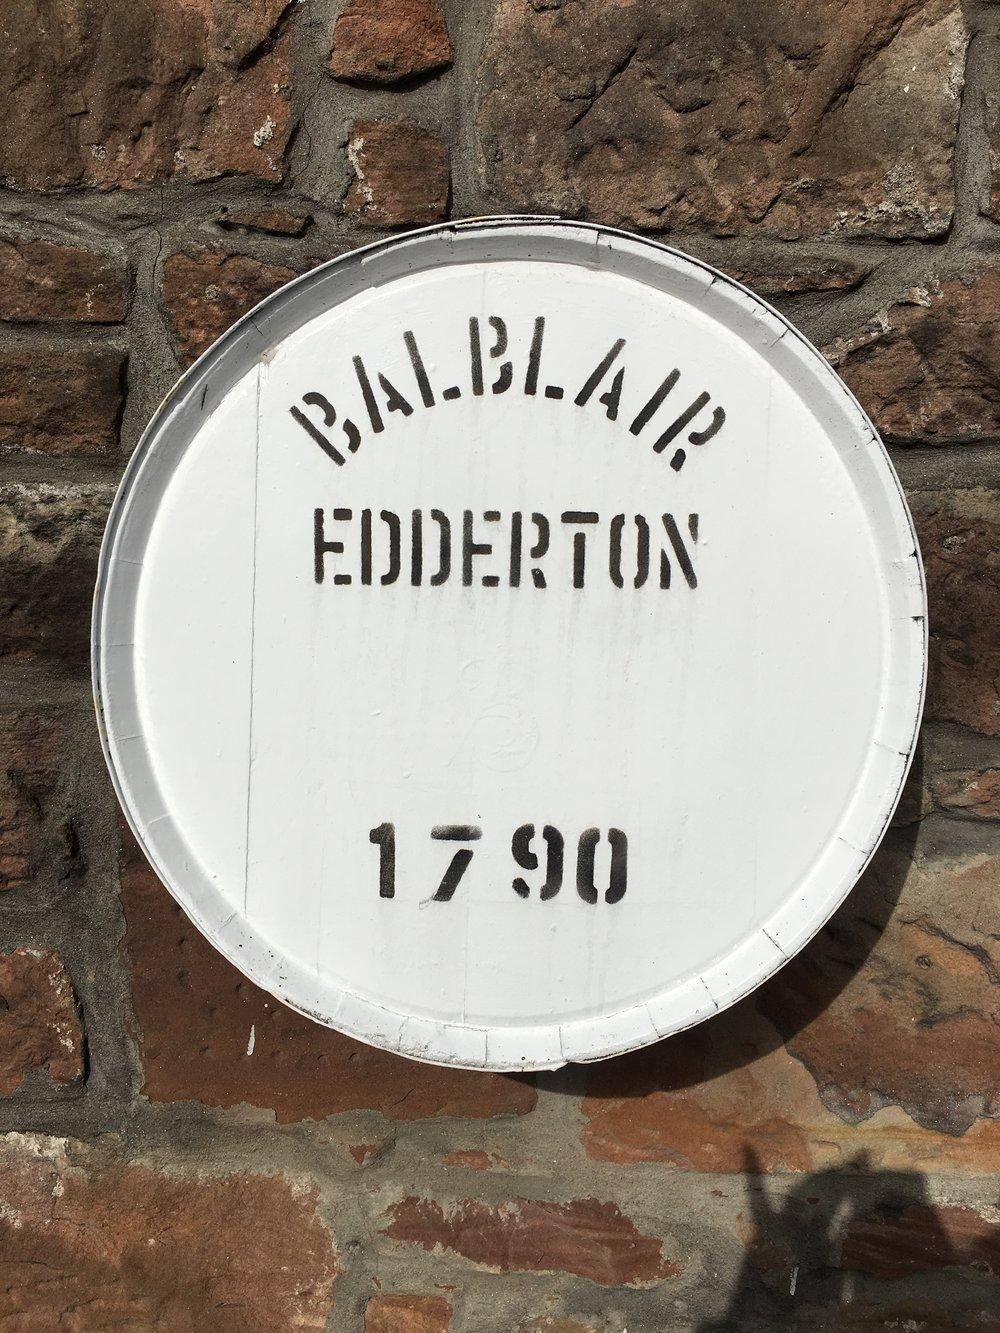 Balblair Distillery 2017